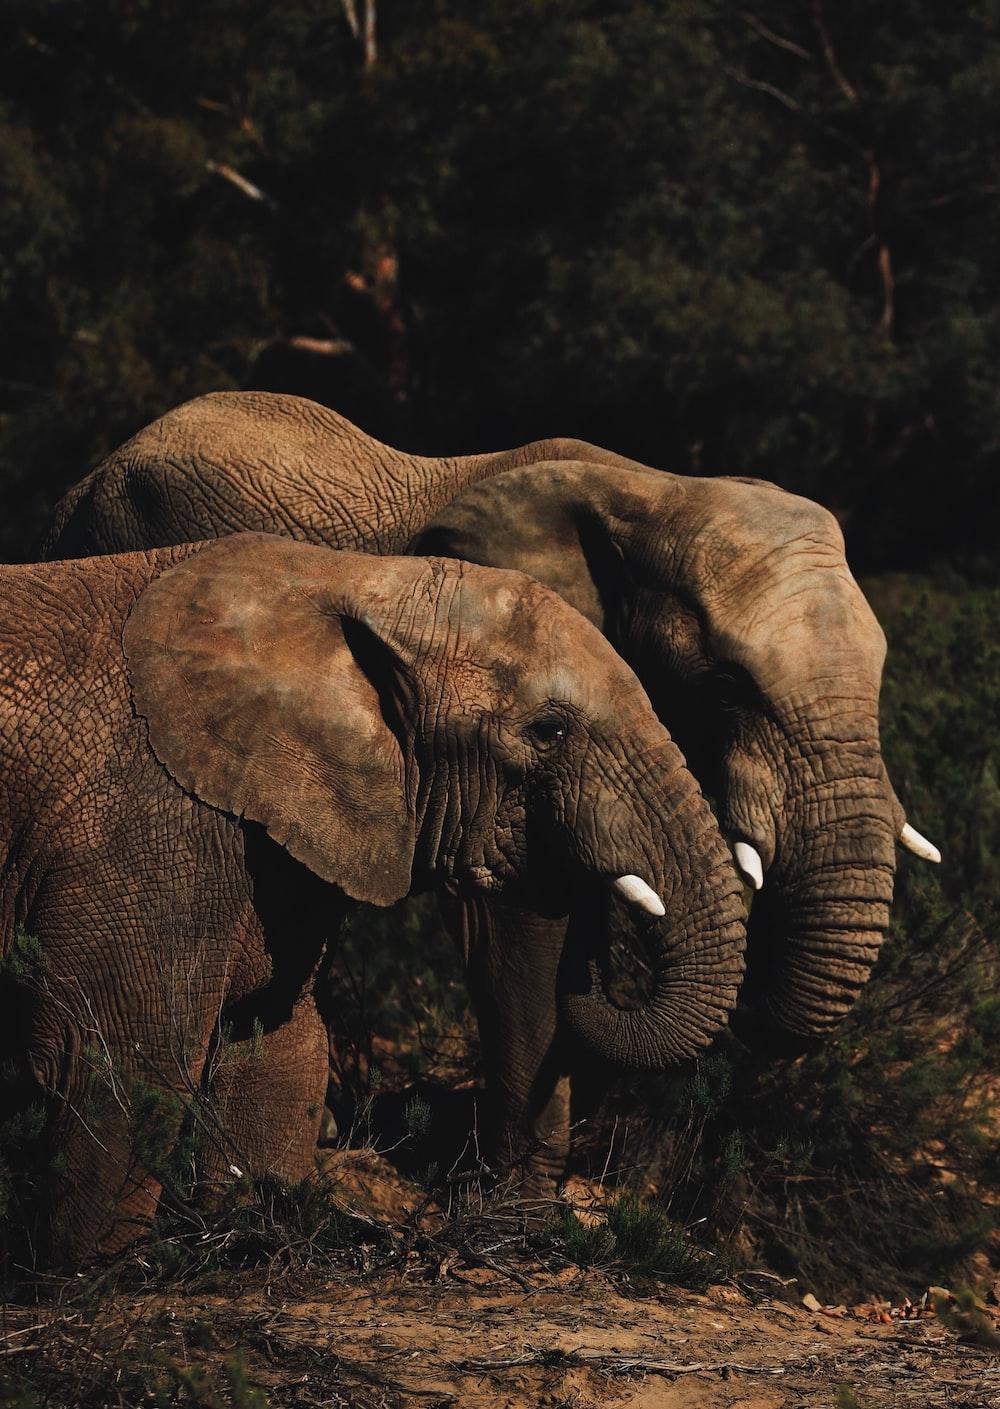 two brown elephants